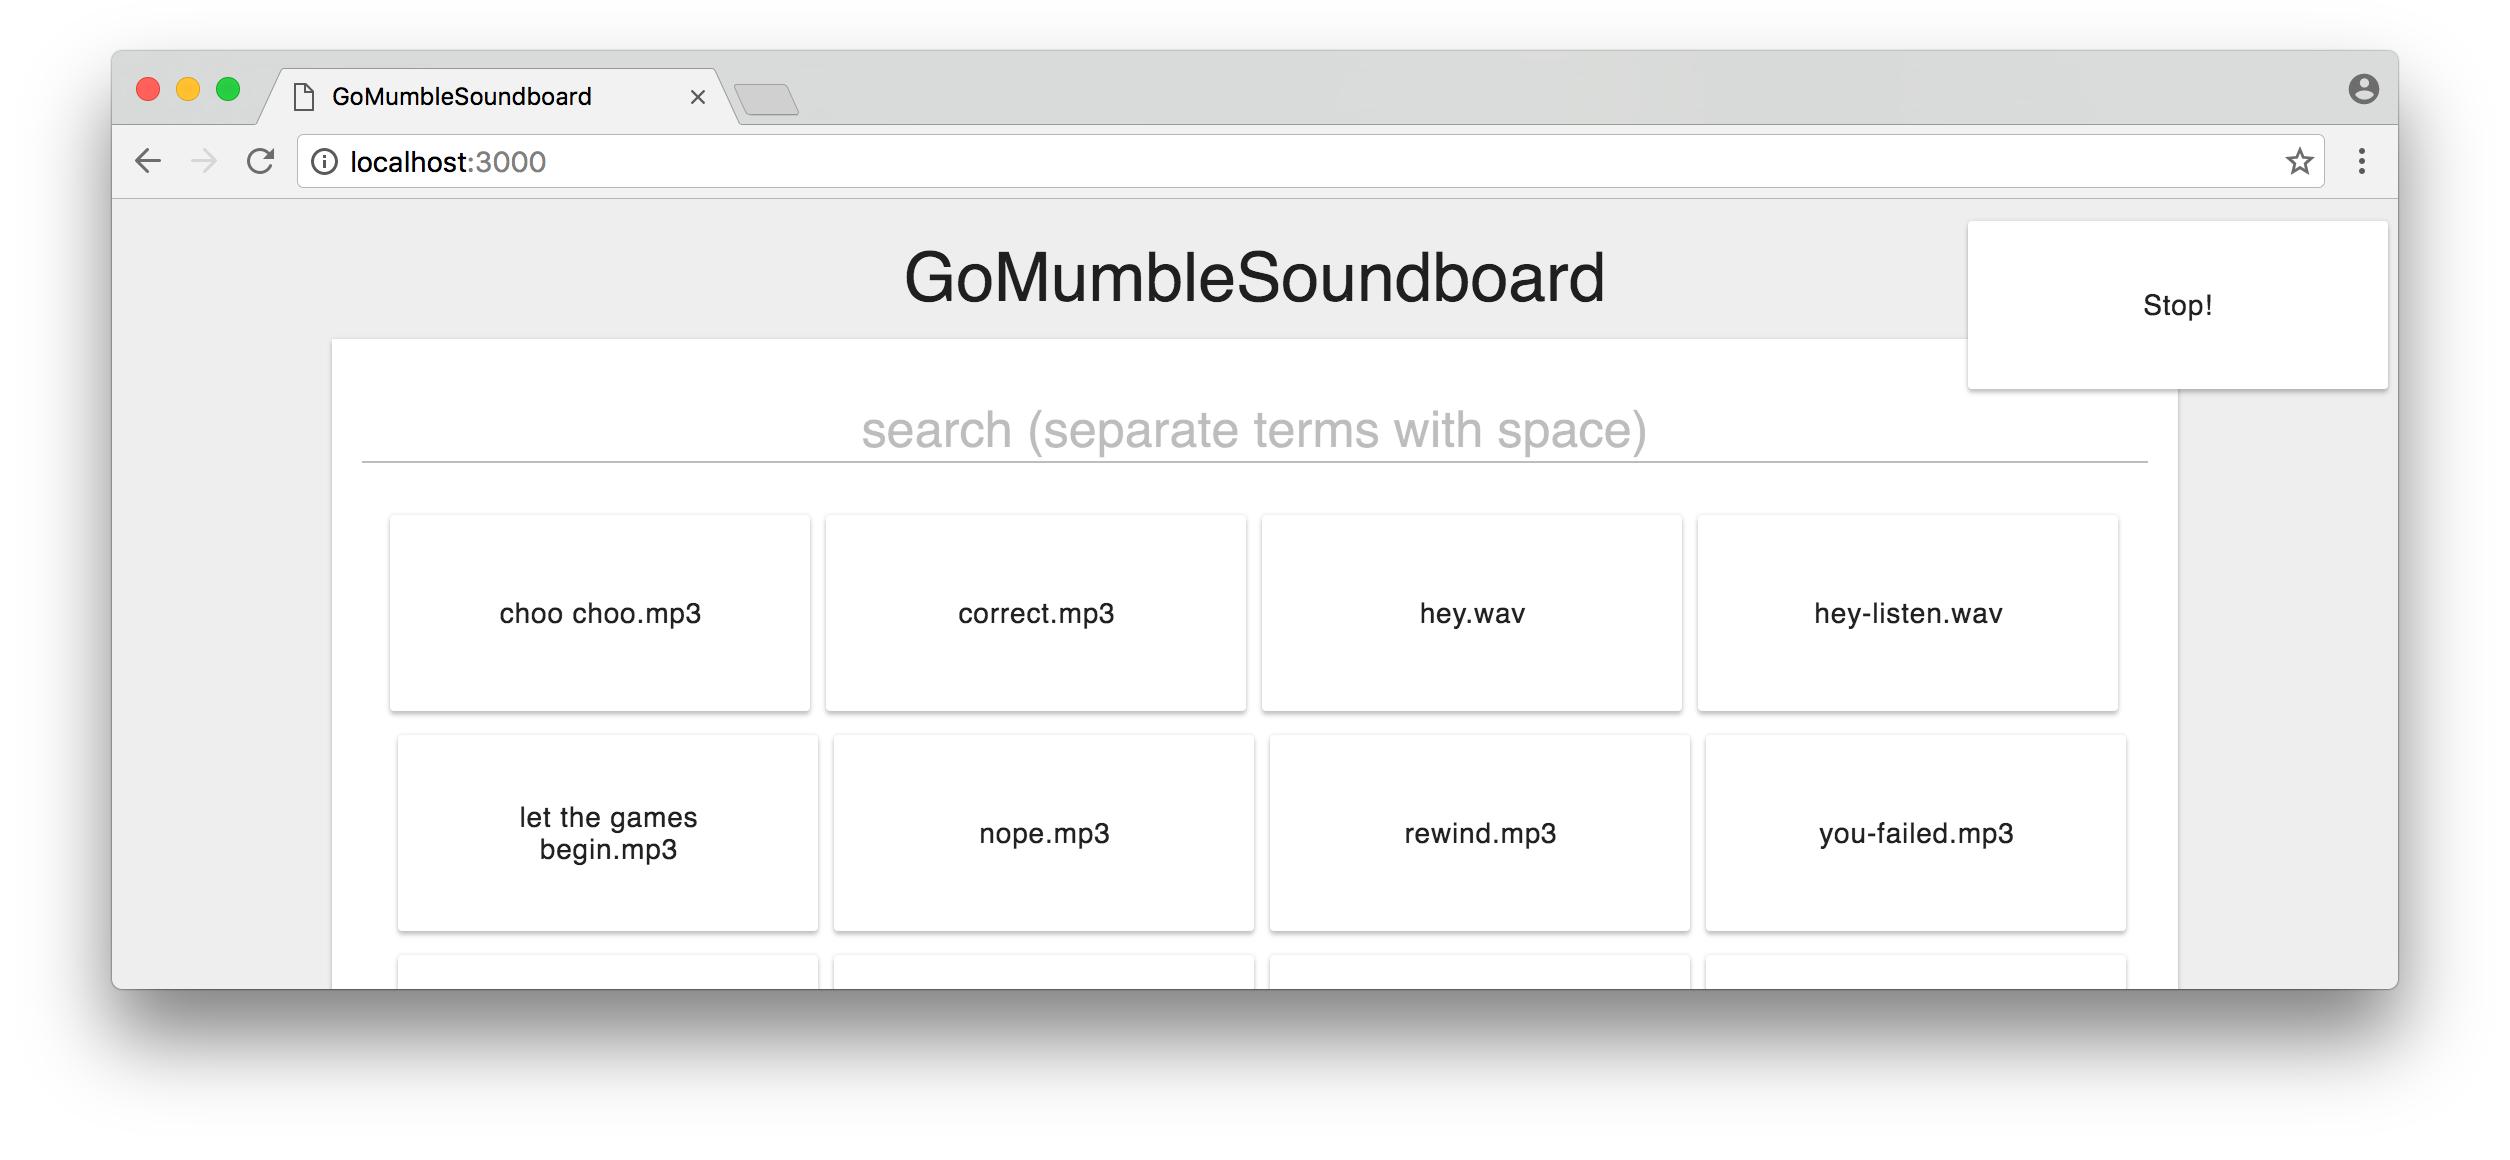 gomumblesoundboard